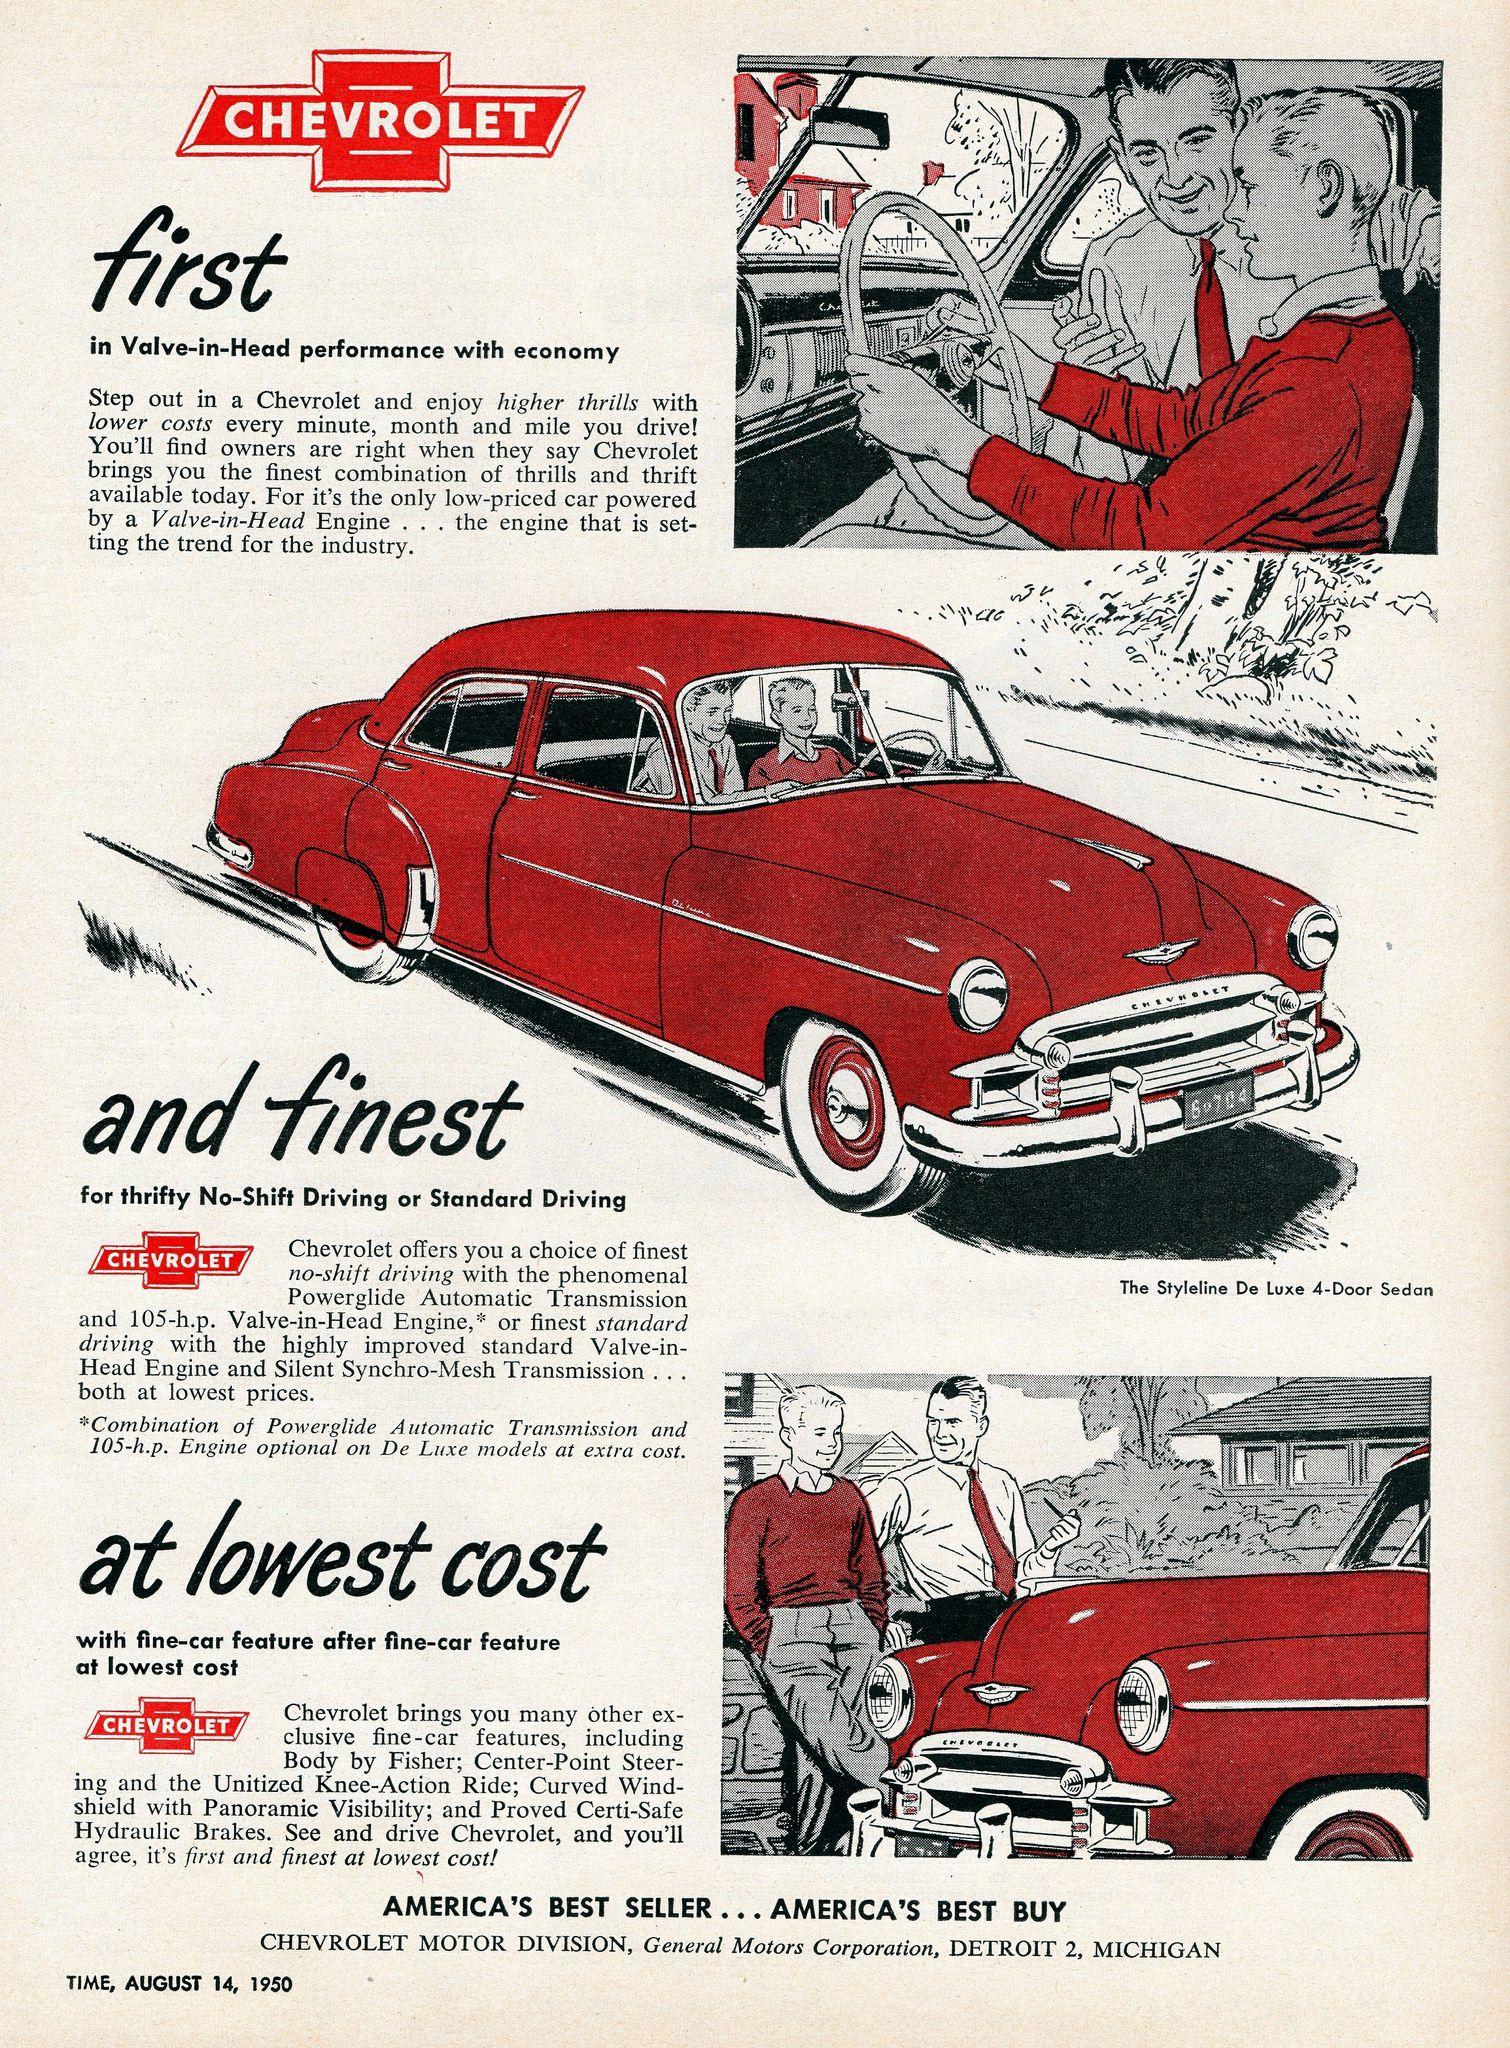 1950 Chevrolet Styleline De Luxe 4 Door Sedan Chevrolet Car Advertising Automobile Advertising